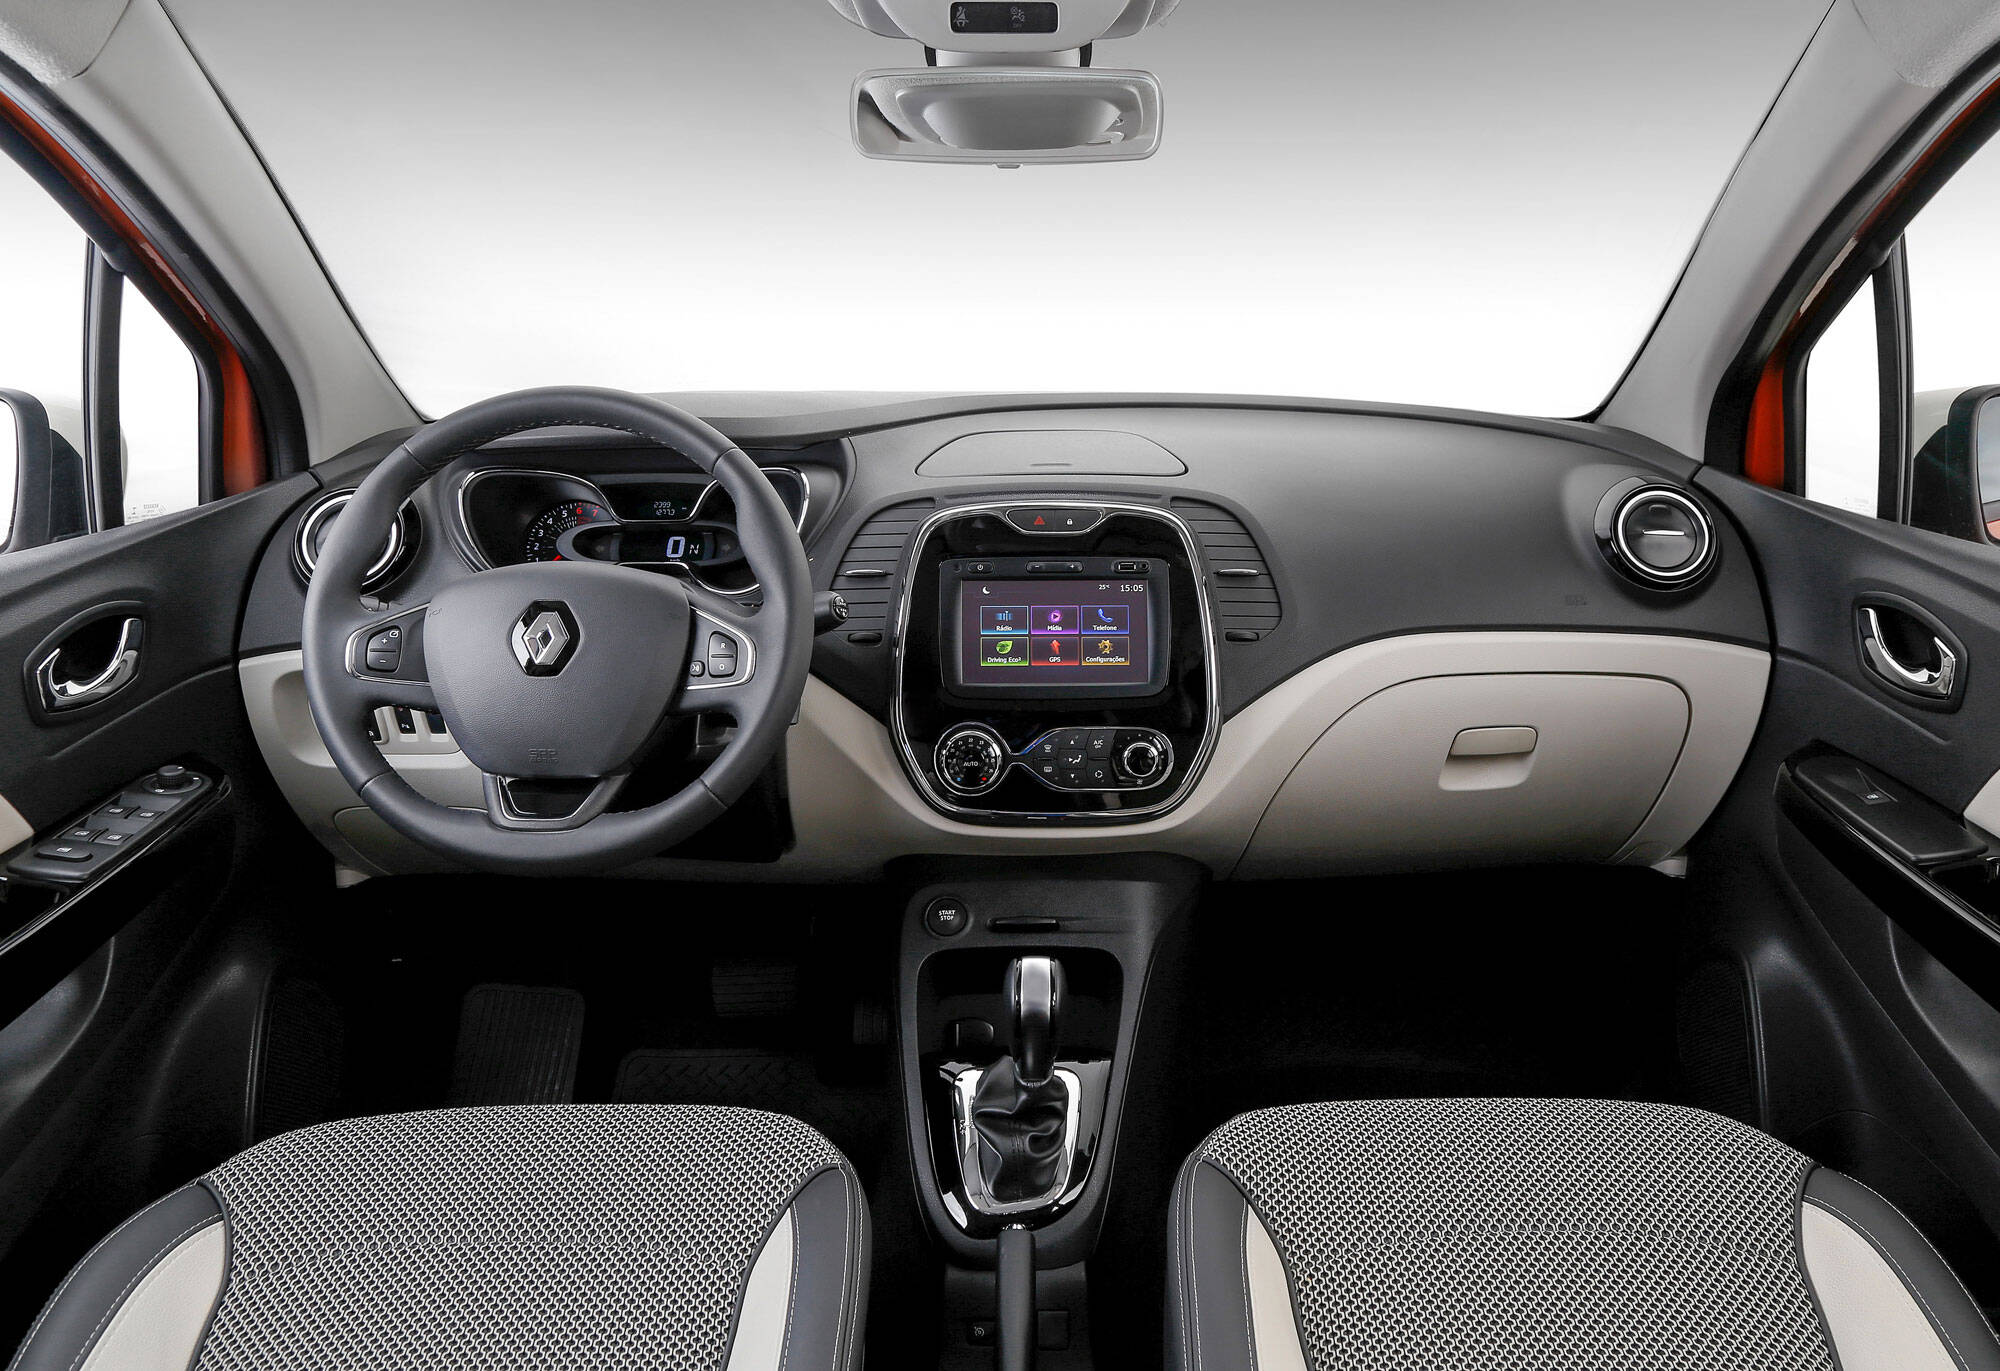 Renault Captur 1.6 CVT. Foto: divulgação/Renault